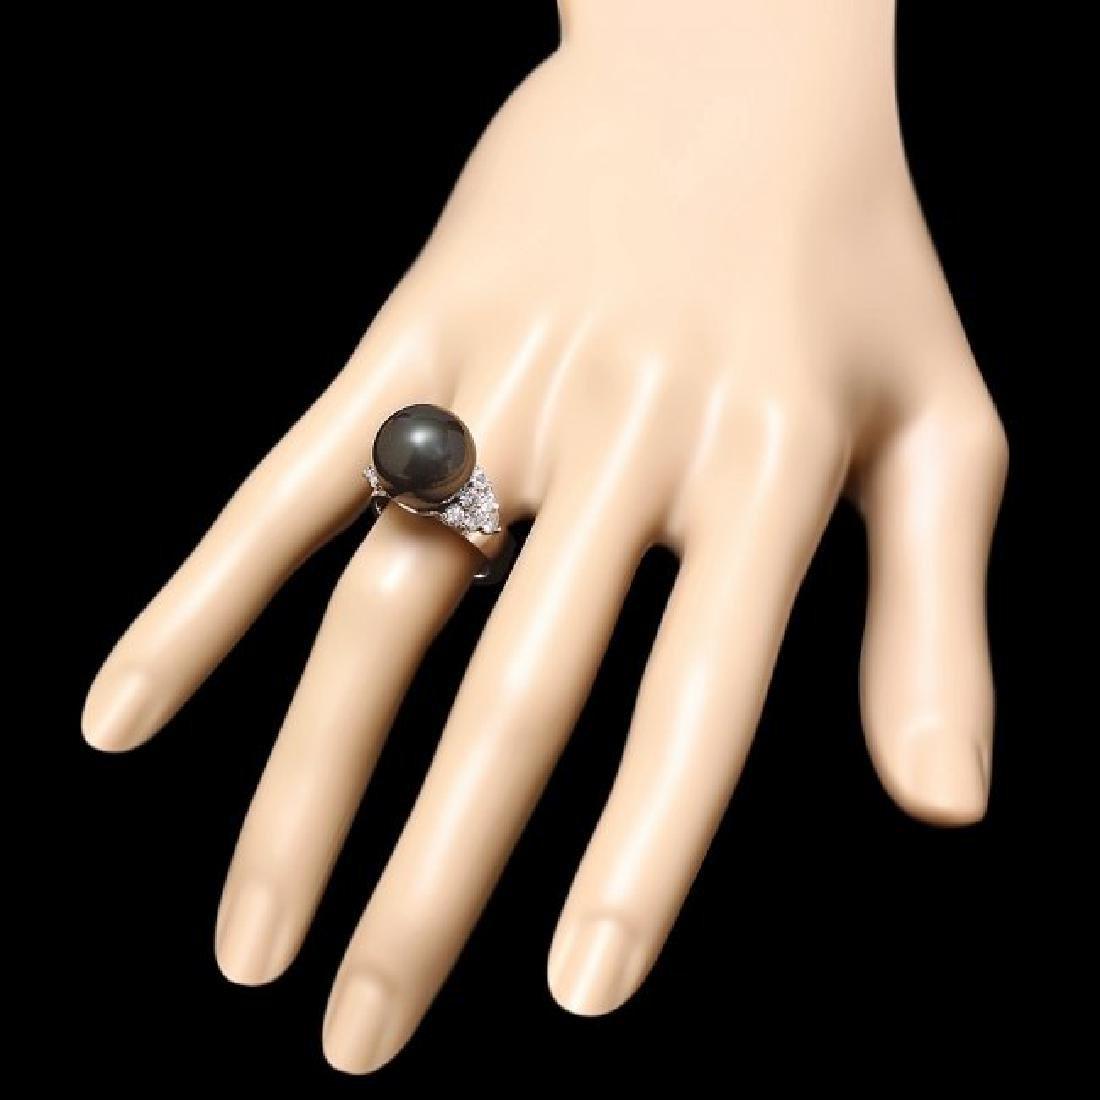 14k Gold 13 X 13mm Pearl 0.85ct Diamond Ring - 3